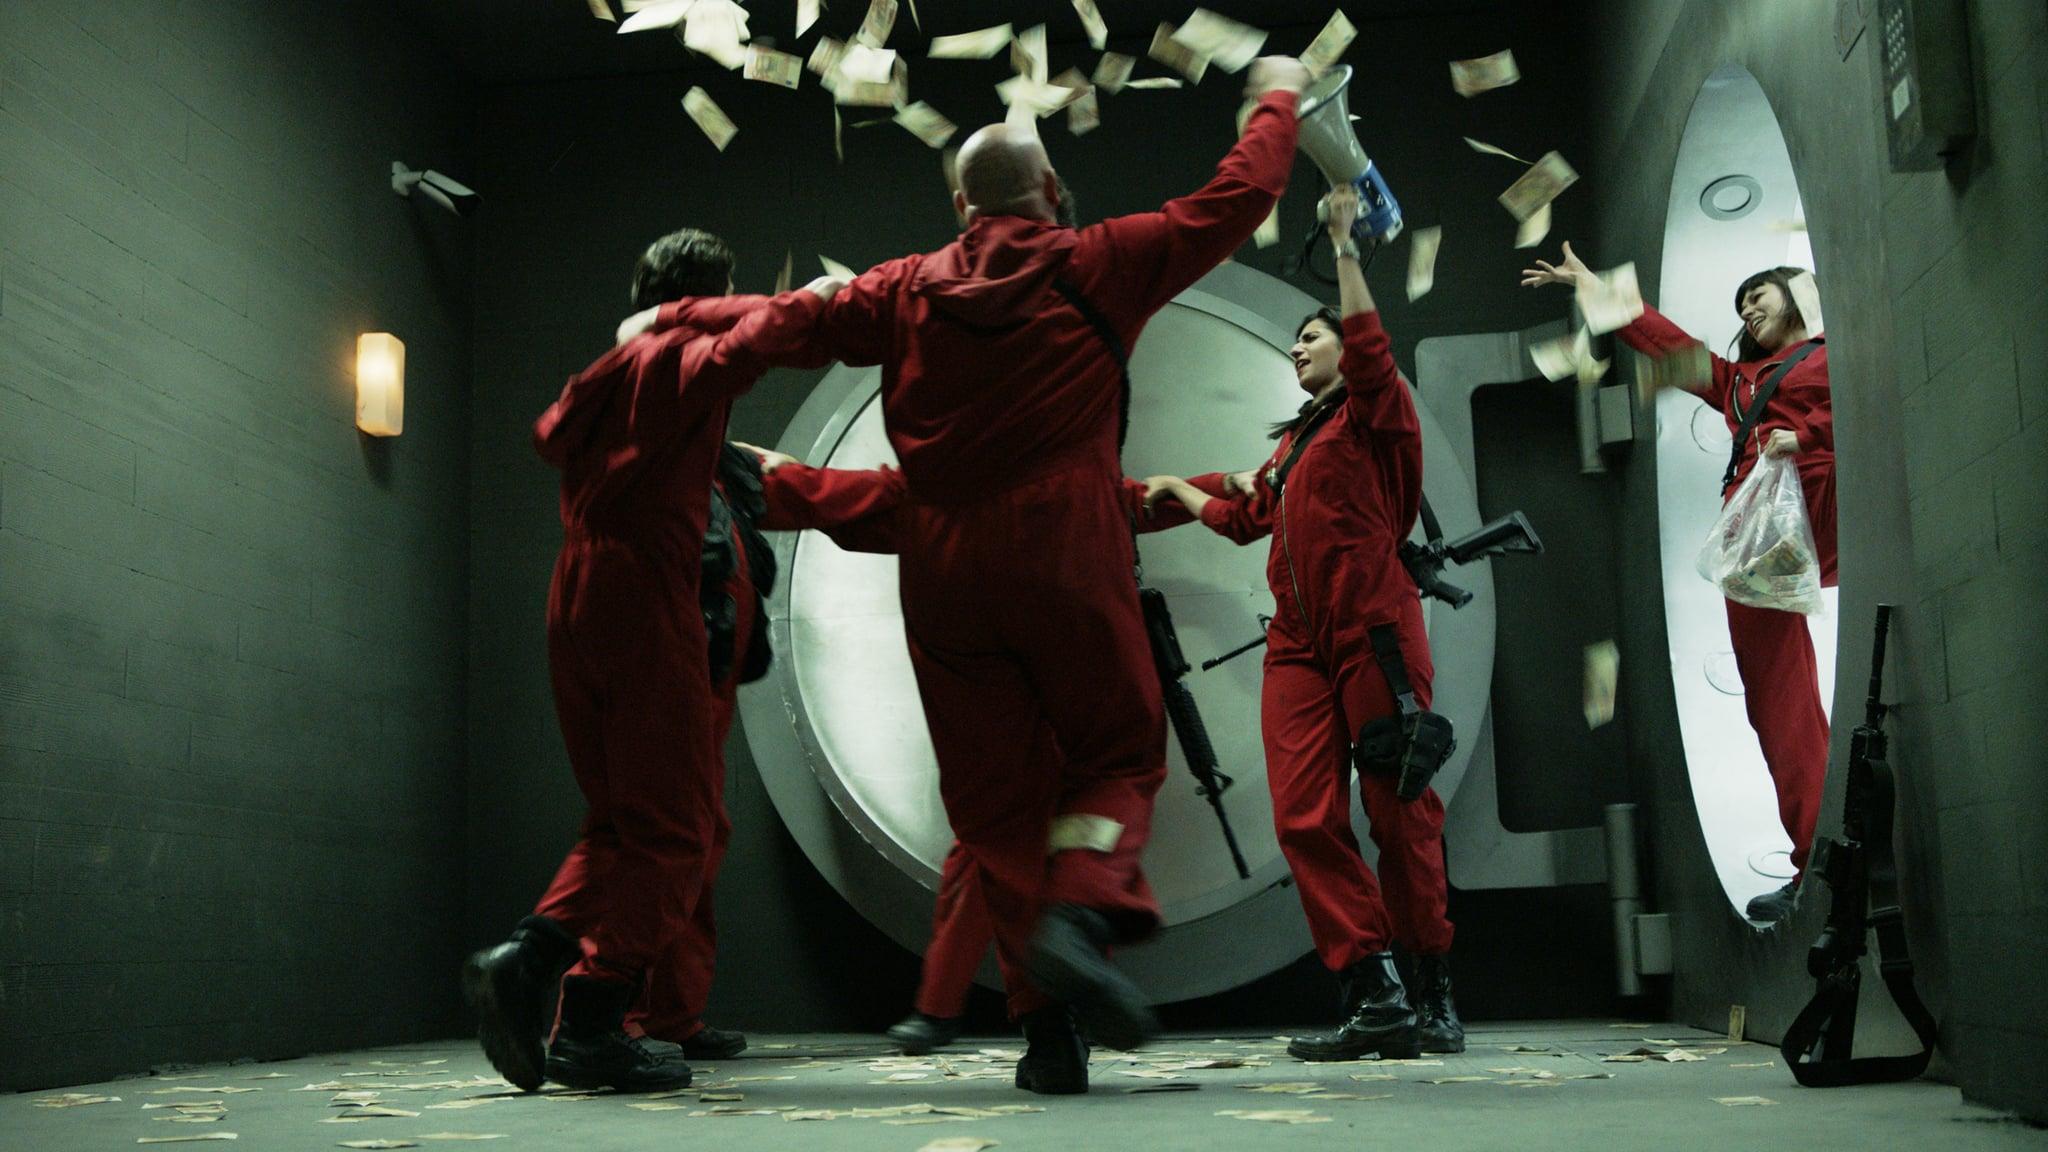 MONEY HEIST, (aka LA CASA DE PAPEL), 'Bella Ciao', (Season 1, ep. 115, aired in US on April 6, 2018). photo: Netflix/Antena 3 / Courtesy: Everett Collection